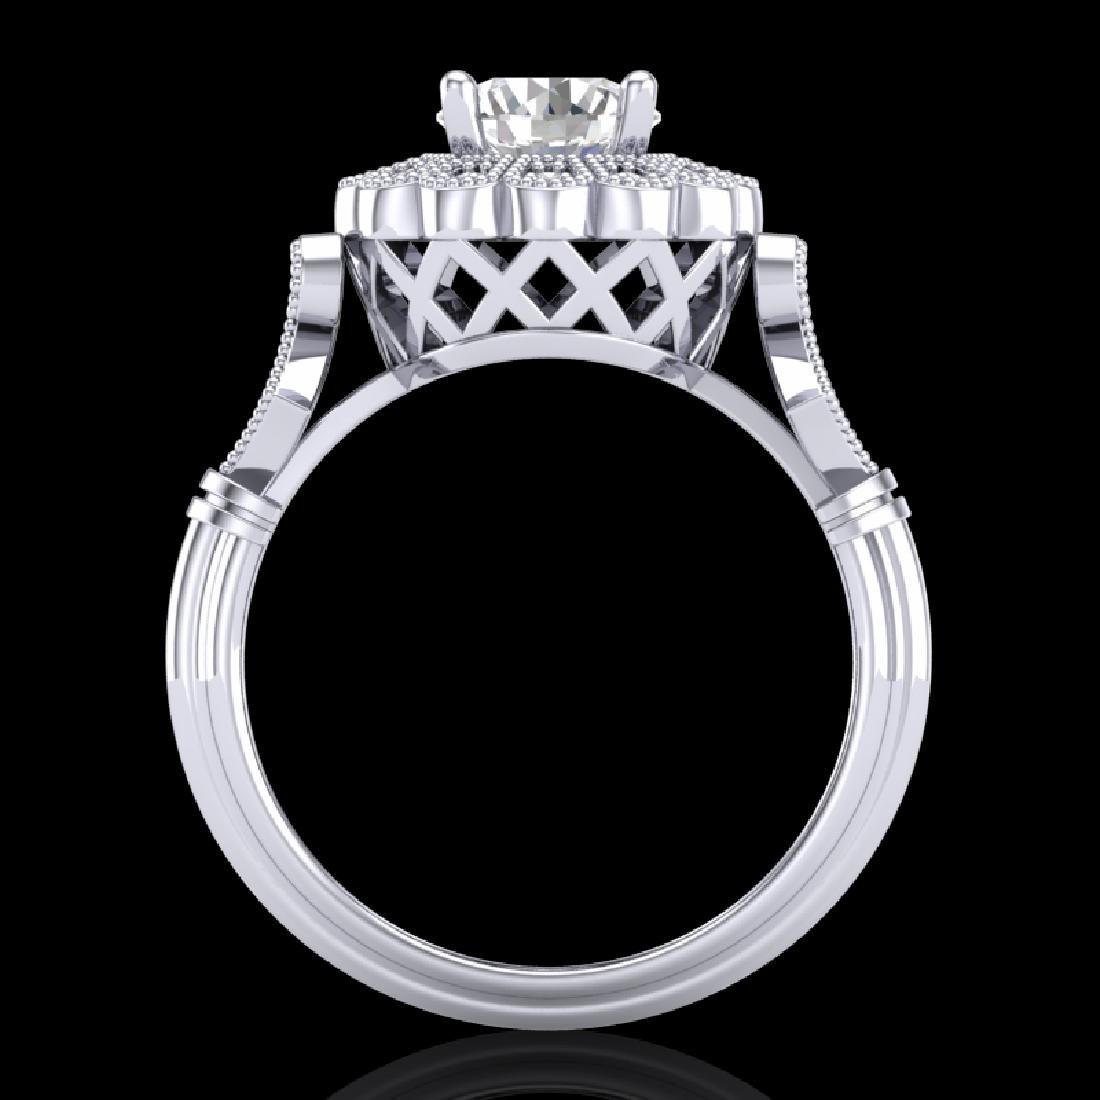 1.2 CTW VS/SI Diamond Solitaire Art Deco Ring 18K White